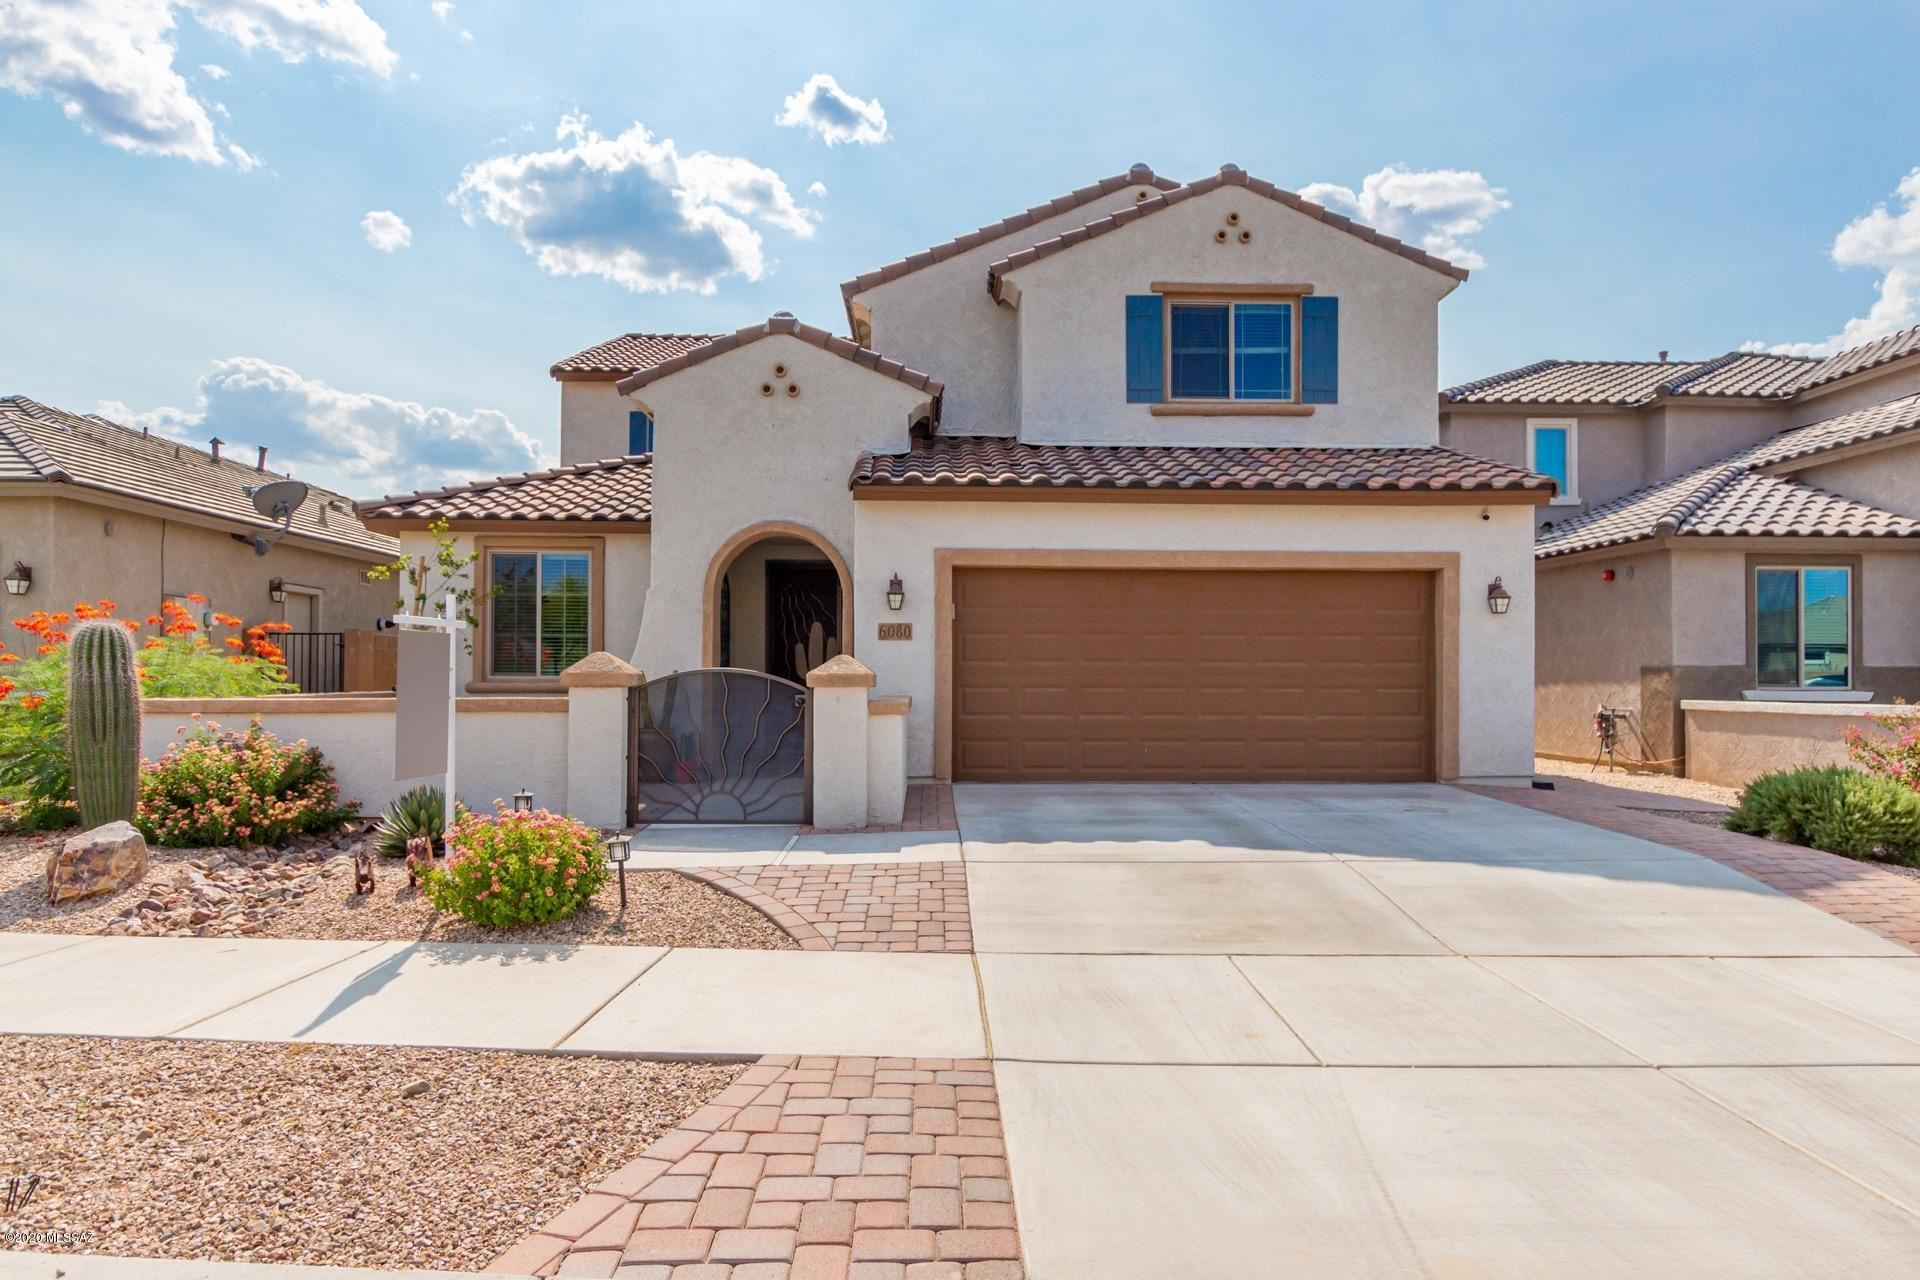 6080 S Lily Magnolia Way, Tucson, AZ 85747 - MLS#: 22023254